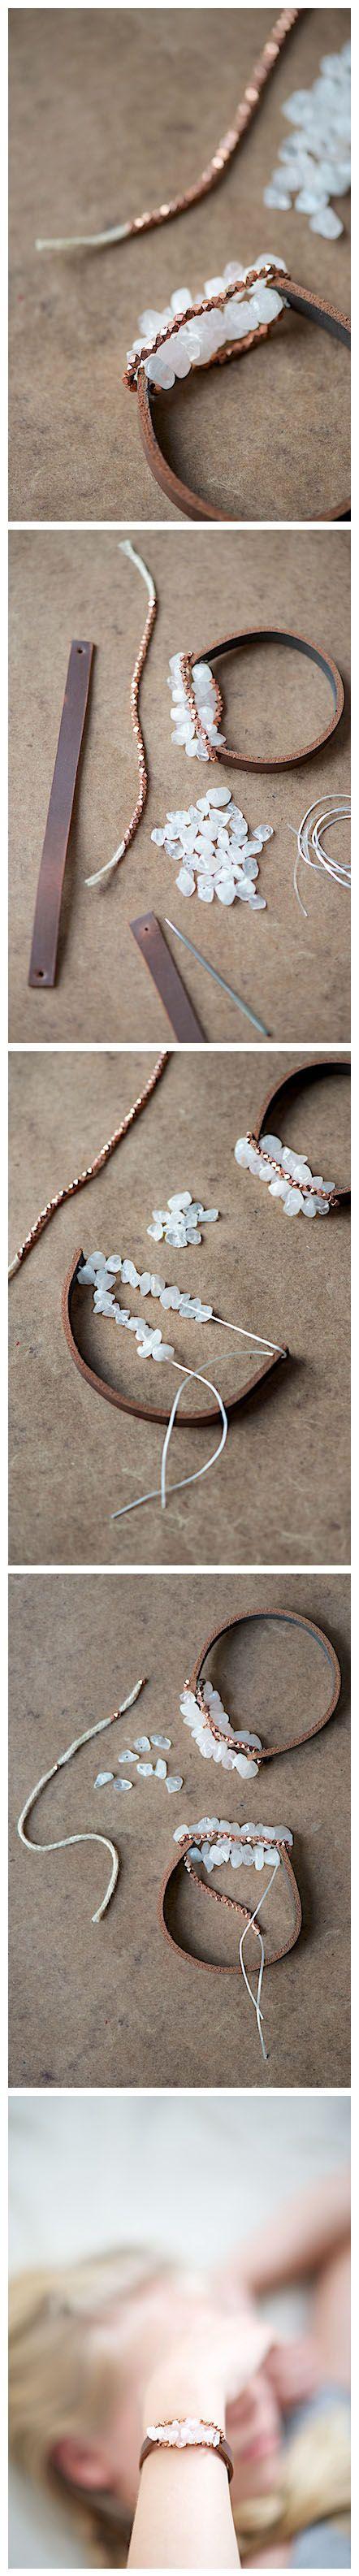 So Beautiful Bracelet | DIY & Crafts